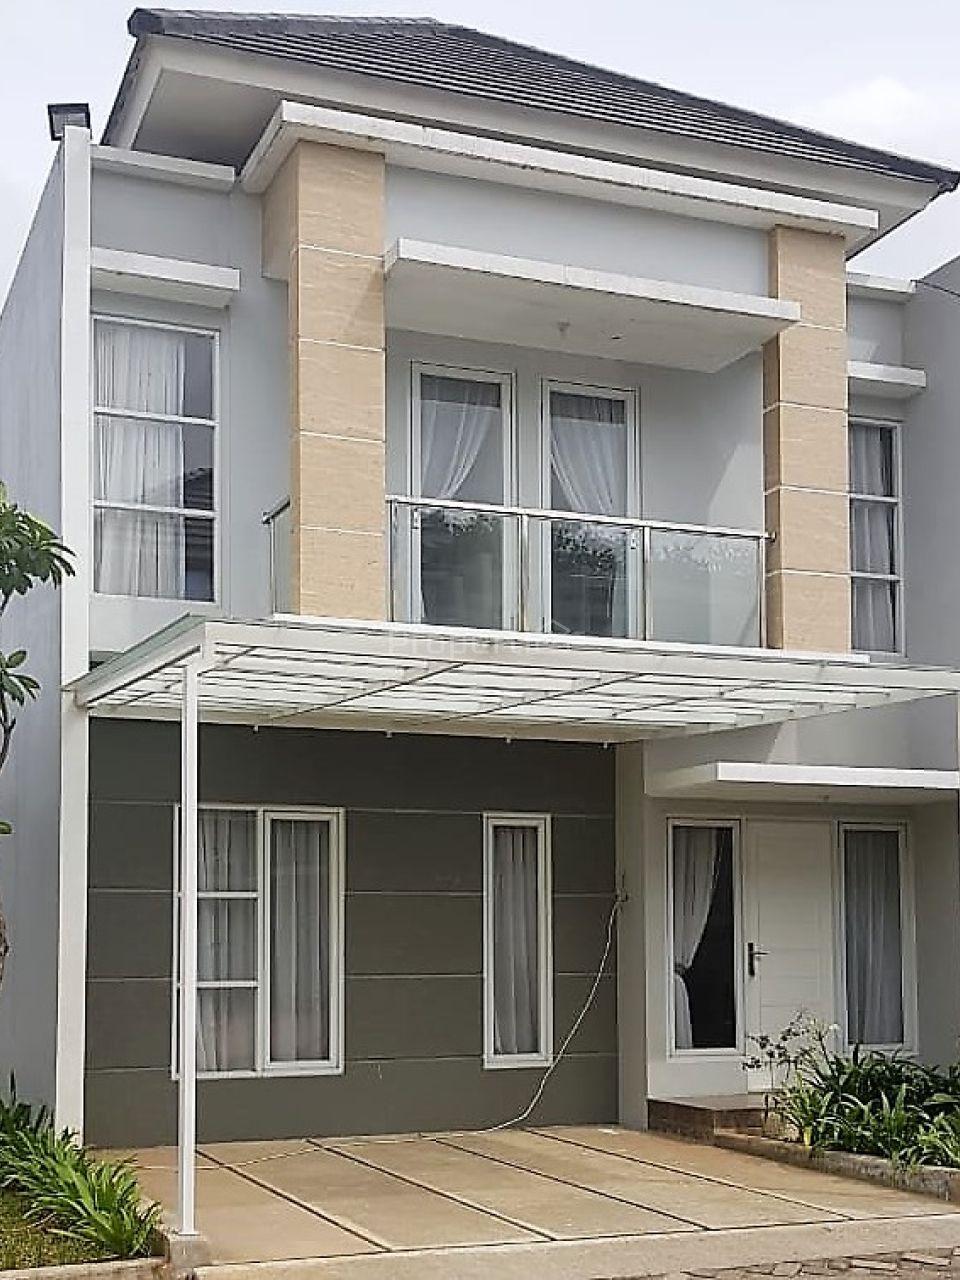 Rumah Baru dalam Cluster, Jatiasih, Jawa Barat